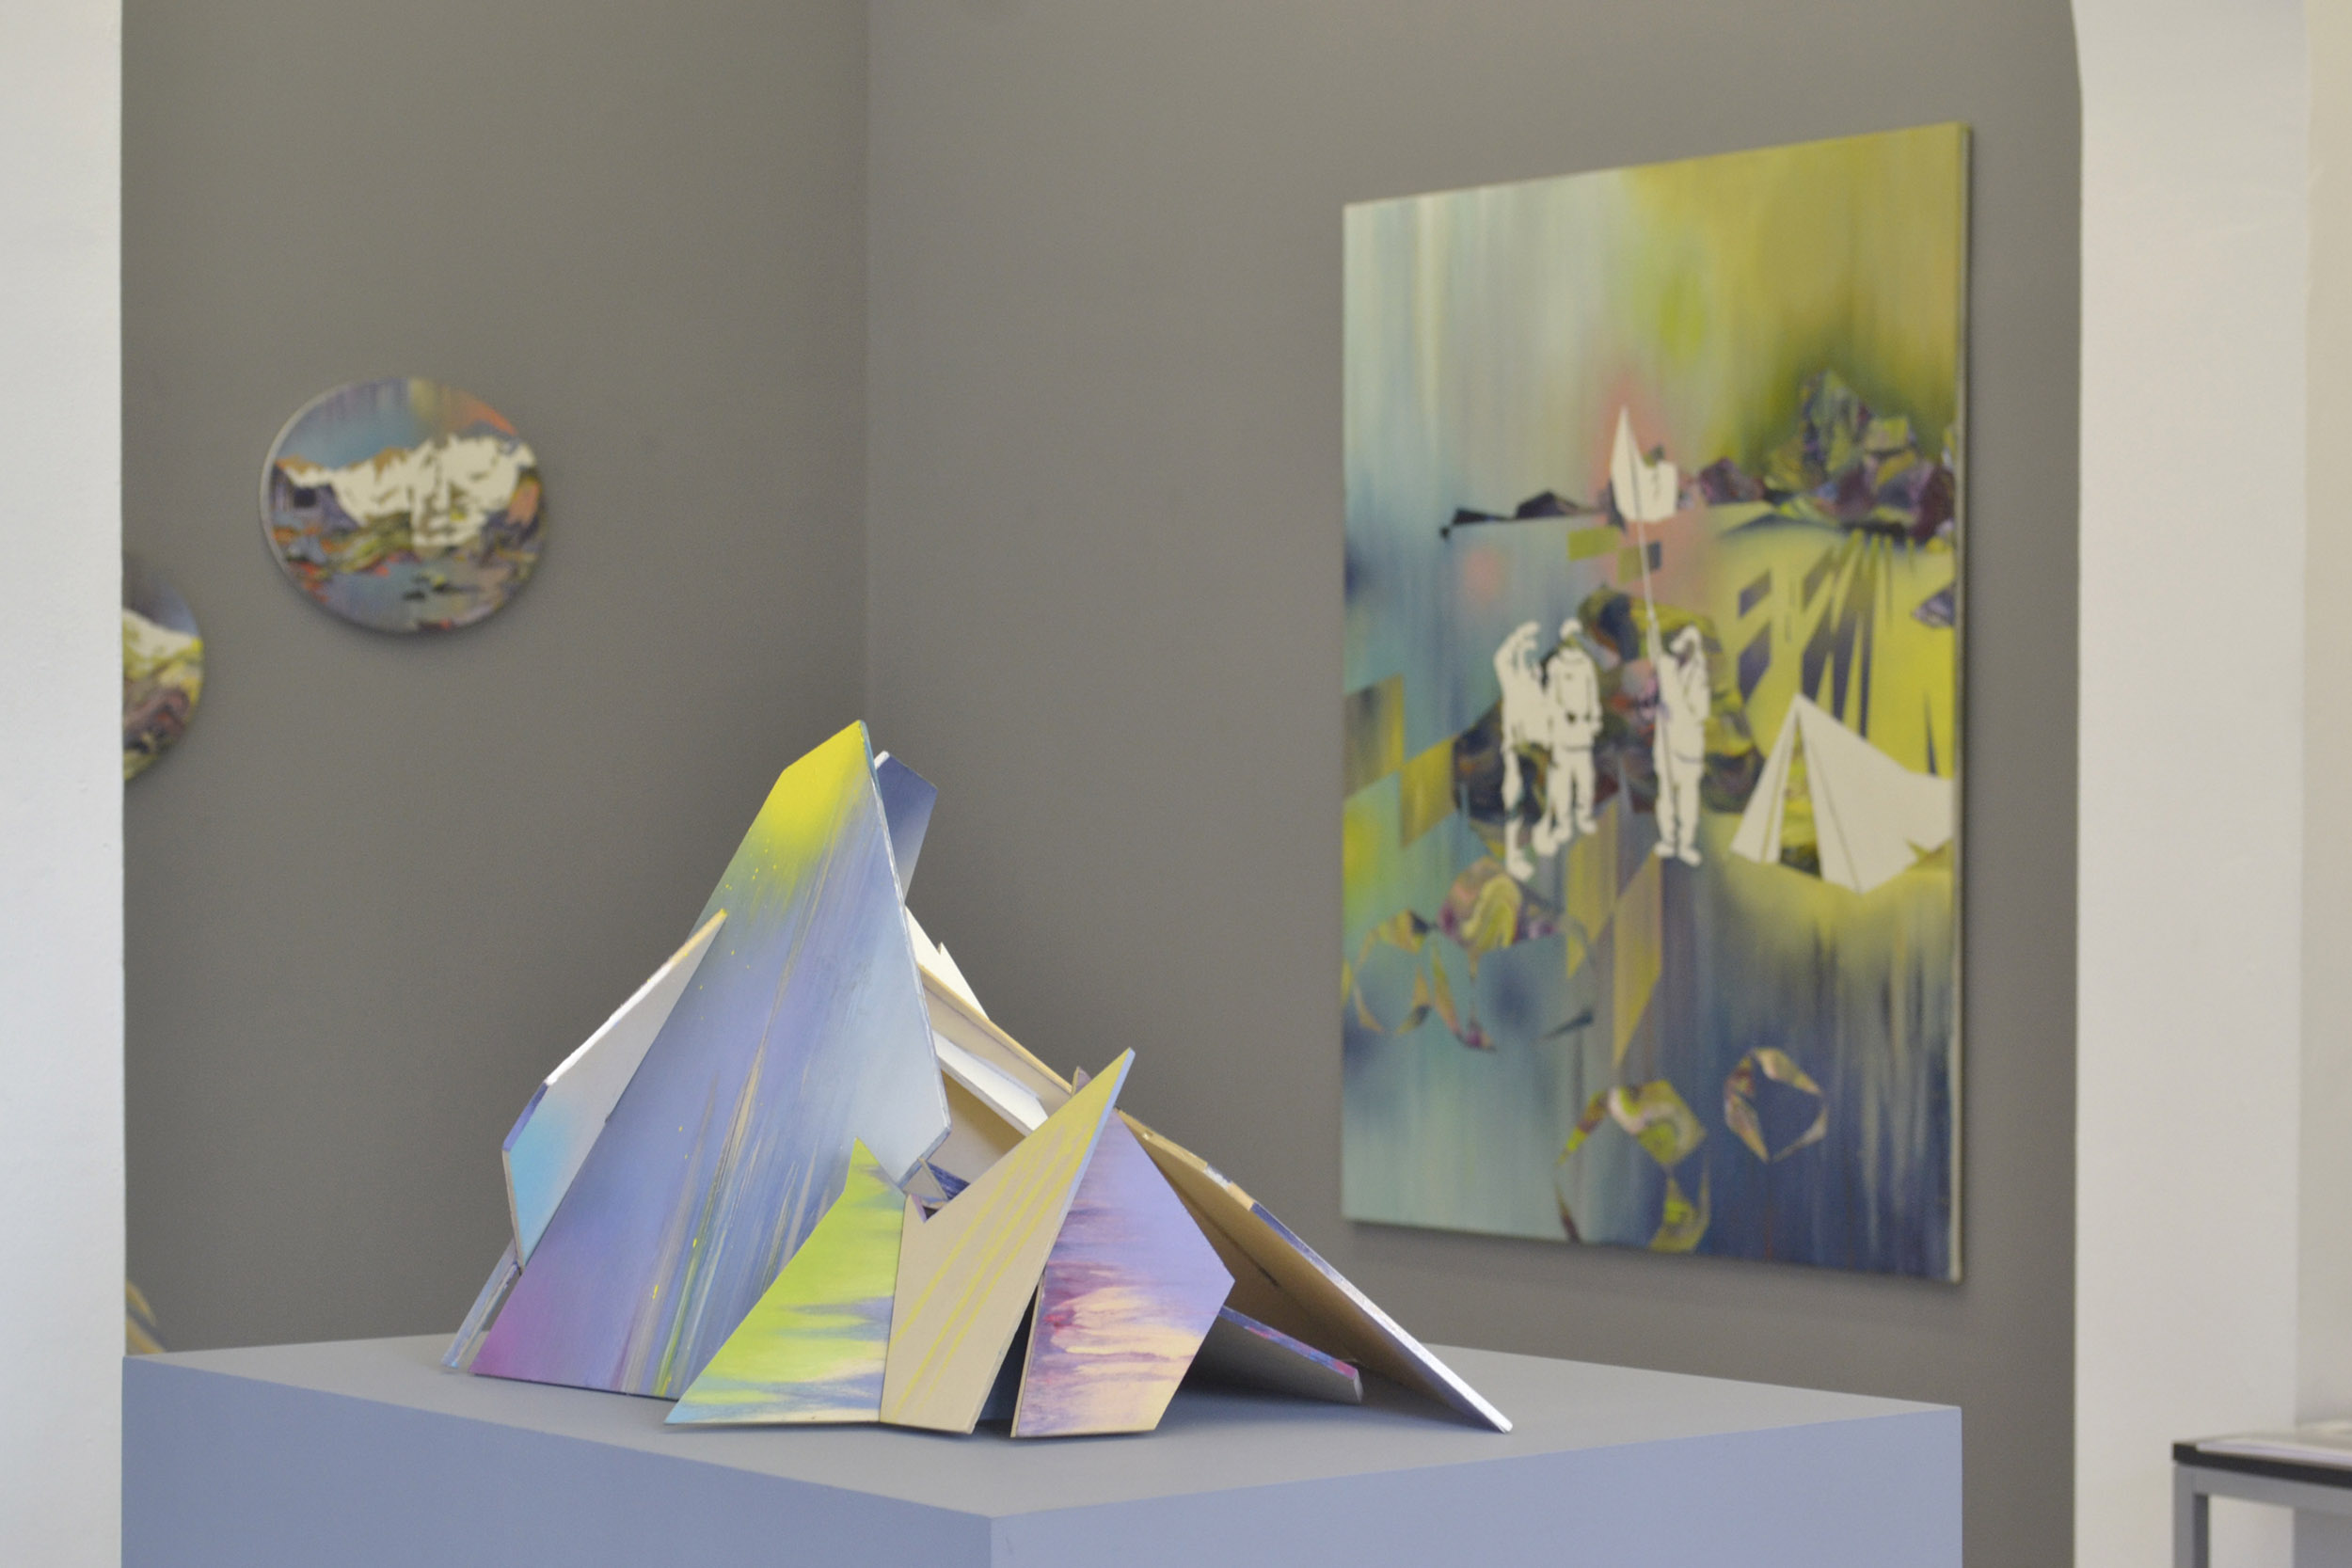 Matthias Moravek, %22Geroell%22, exhibition view11, 2014.jpg